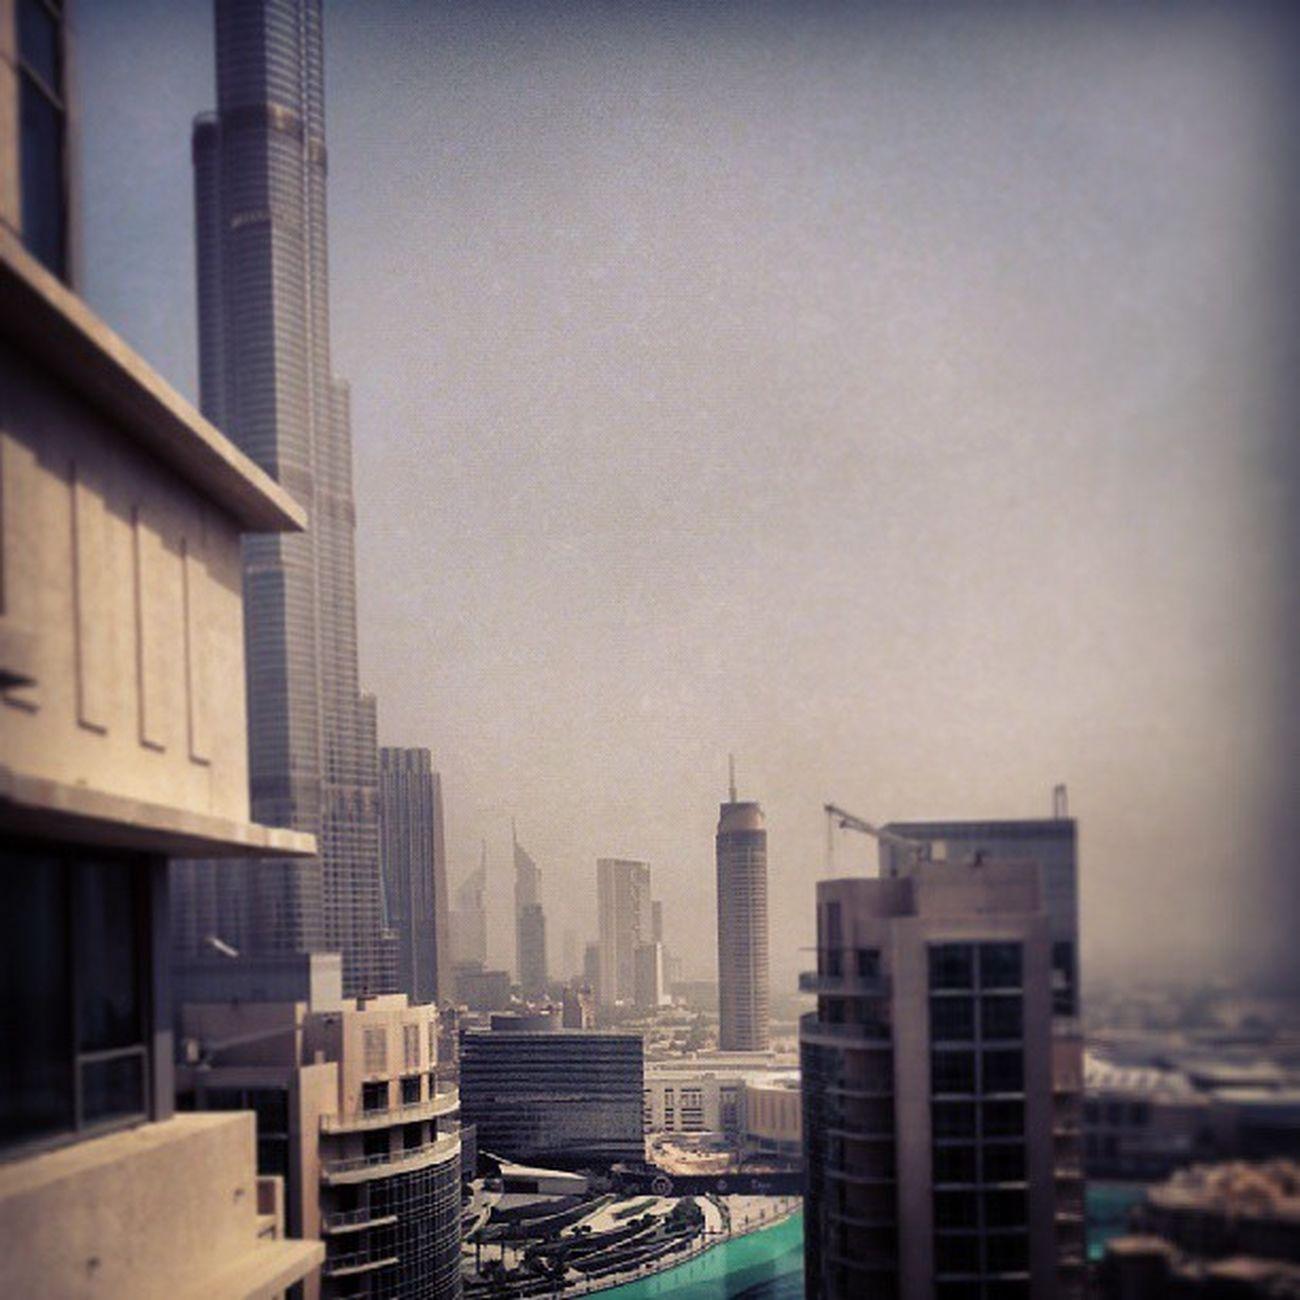 Dubai DXB UAE GCC abudhabi sharjah rak ilovedubai qatar kuwait ksa bahrein saudiarabia instagram instapic burj_khalifa burjkhalifa downtown_dxb downtown back emirates